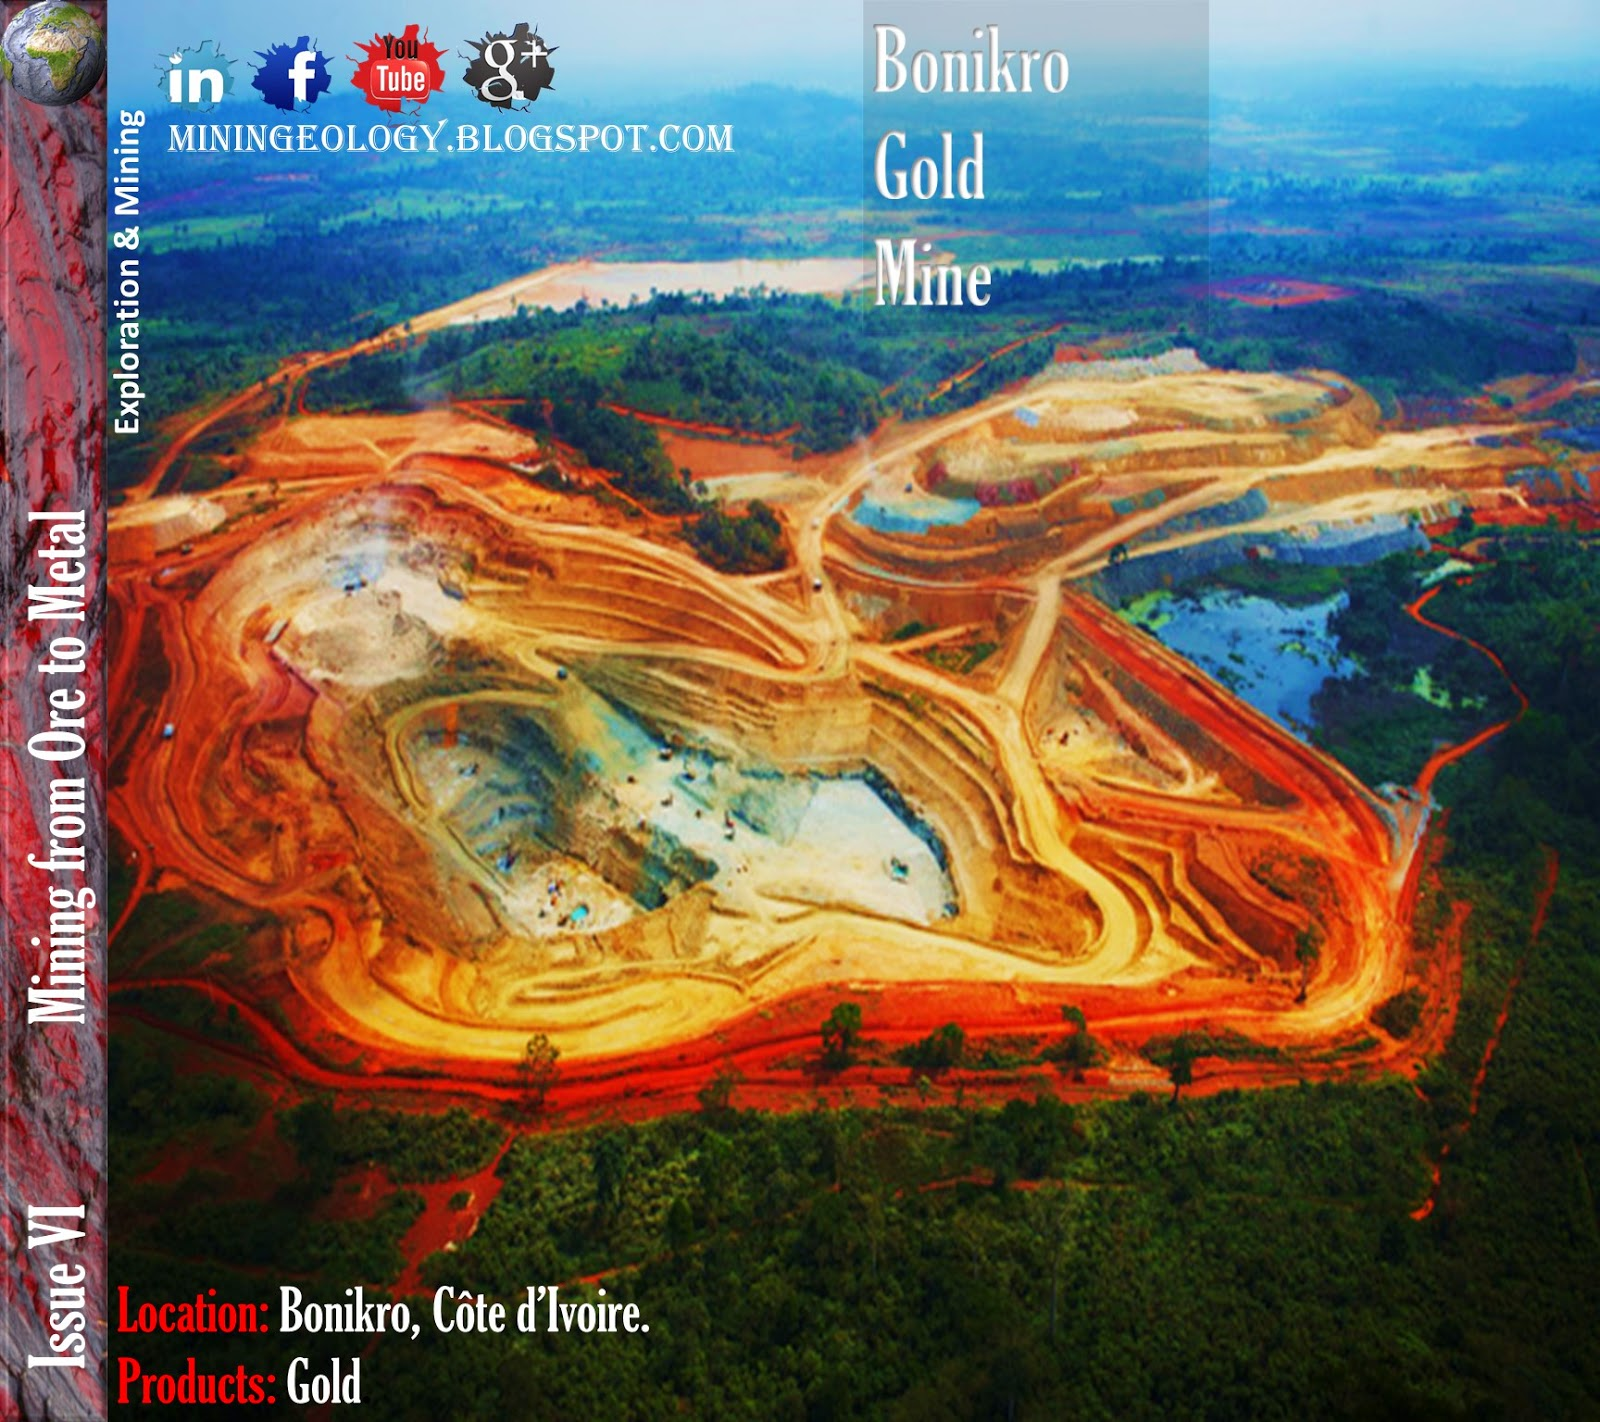 Bonikro Gold Mine